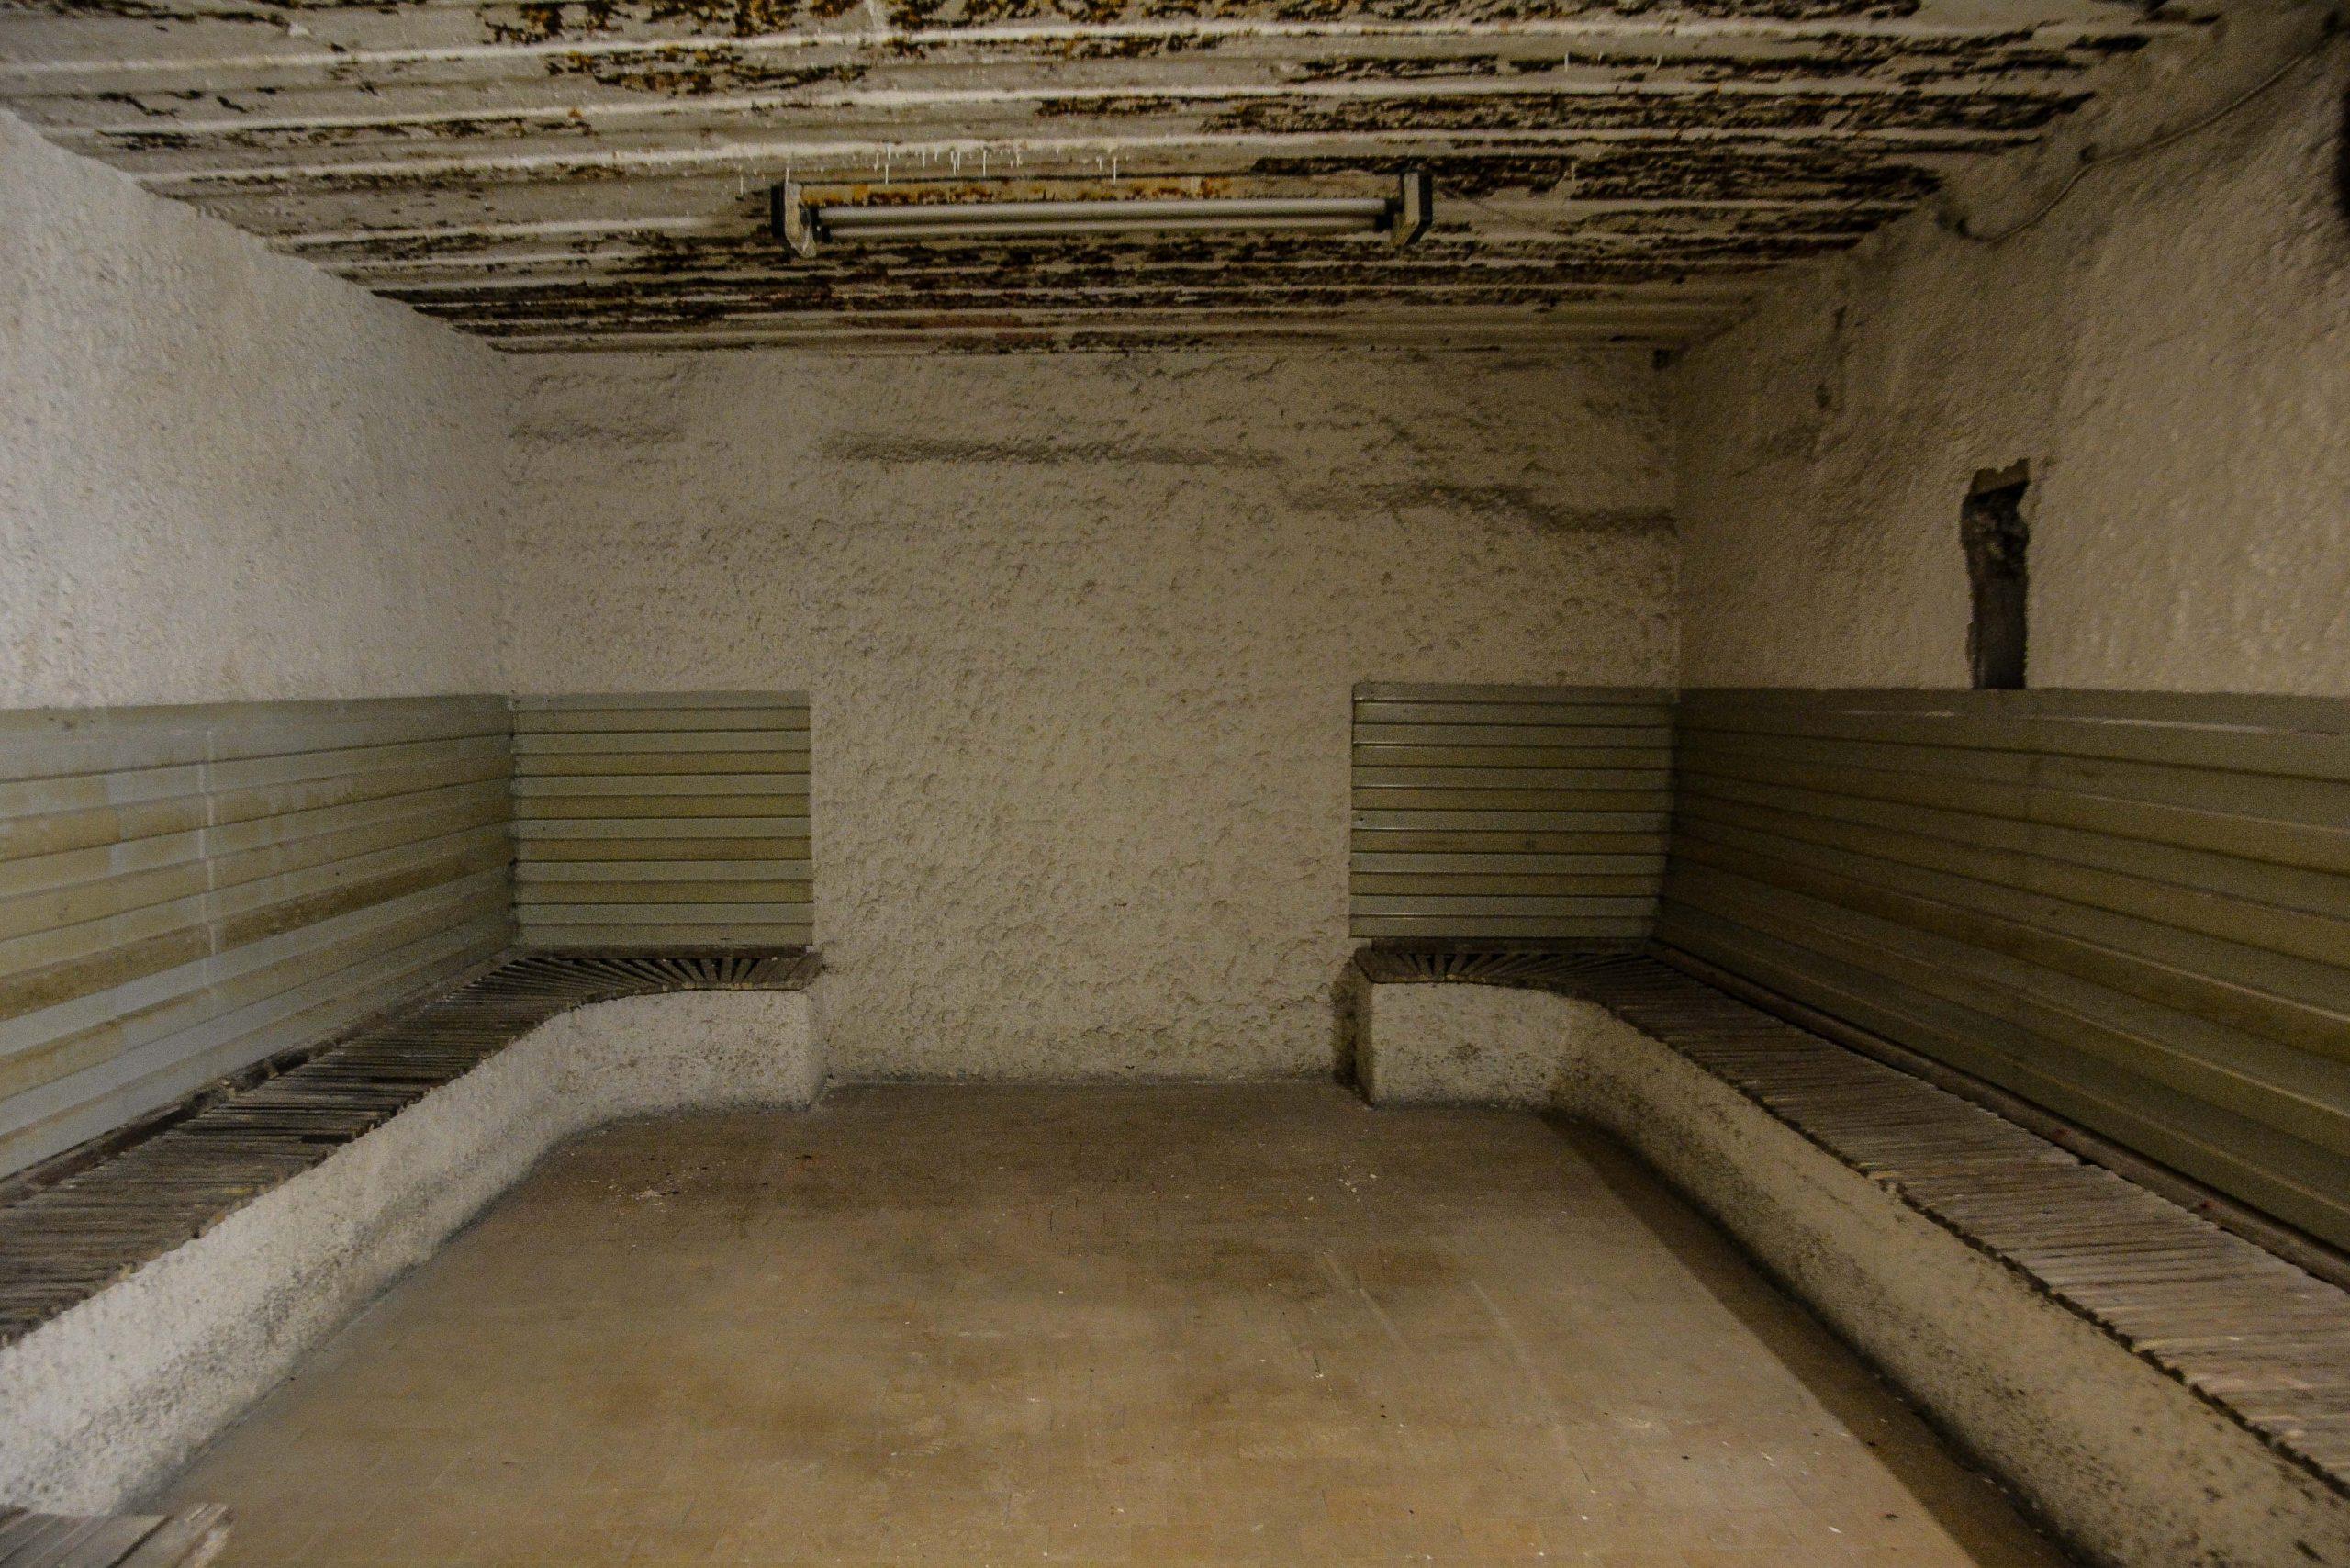 bunker sauna bunker zeppelin amt 500 maybach bunker ranet wehrmacht sowjet soviet military zossen brandenburg germany lost palces urbex abandoned